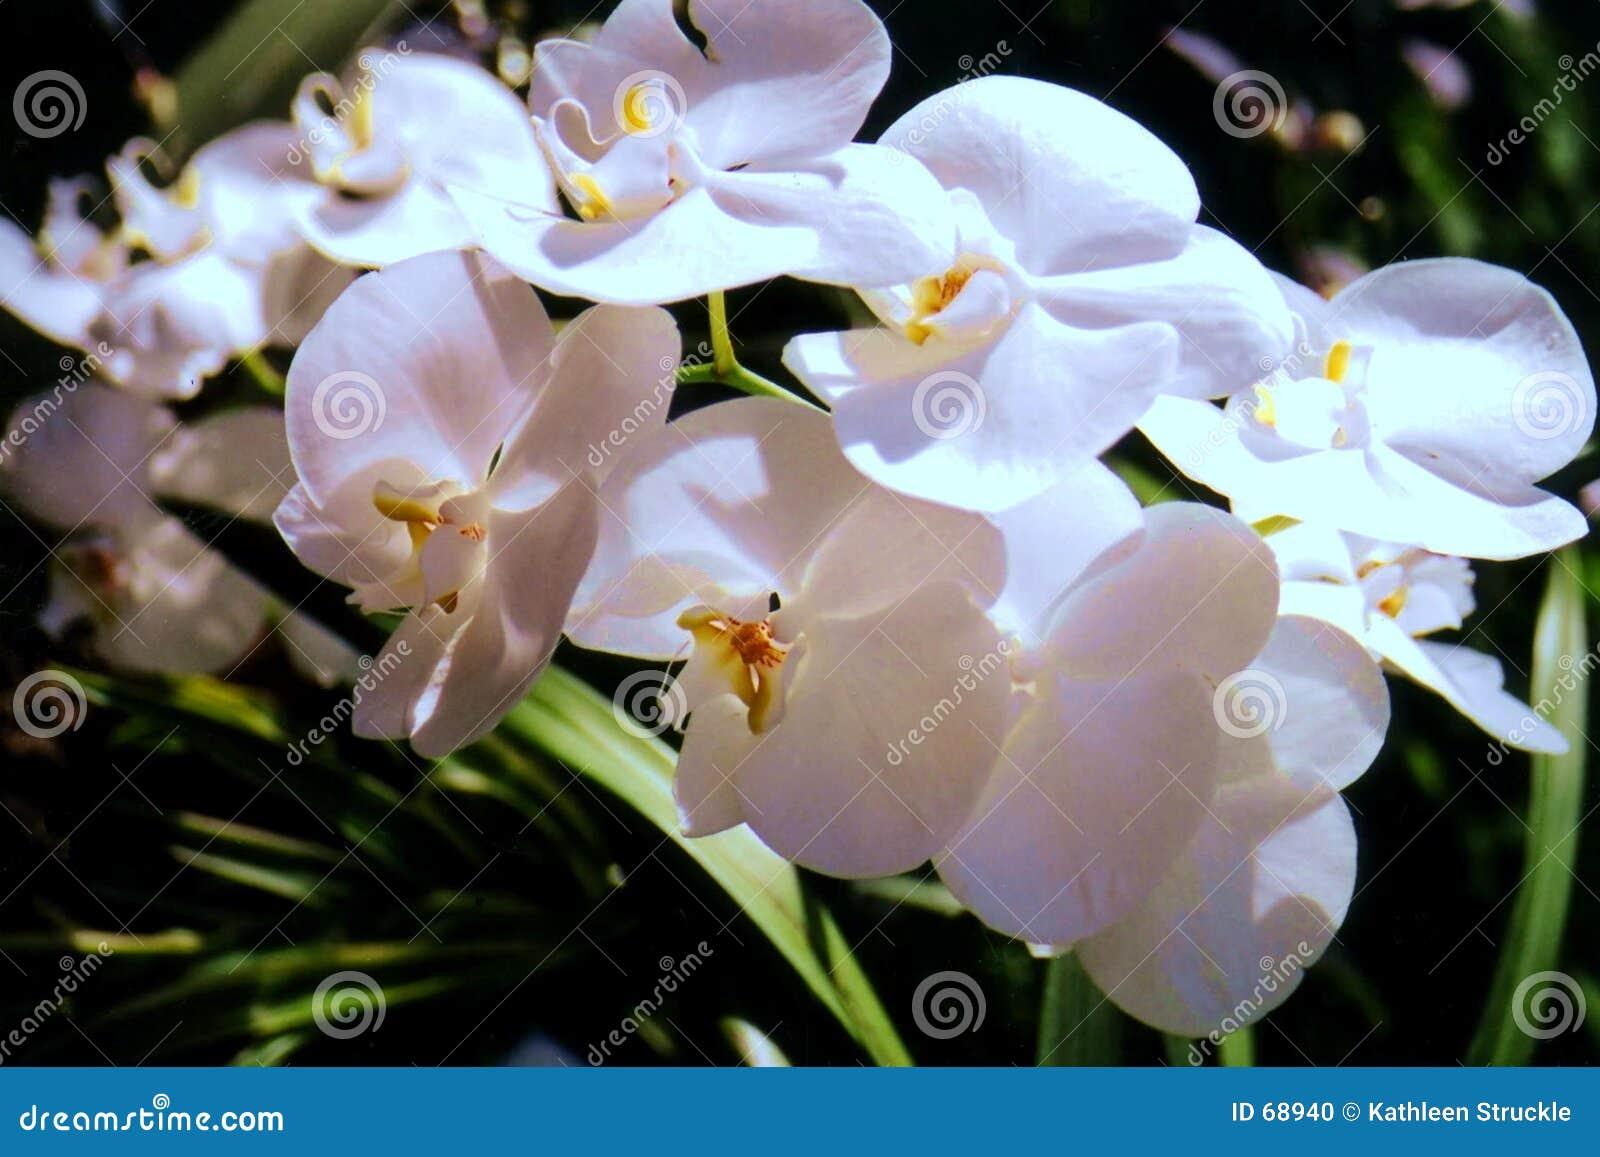 Orchids shamrock